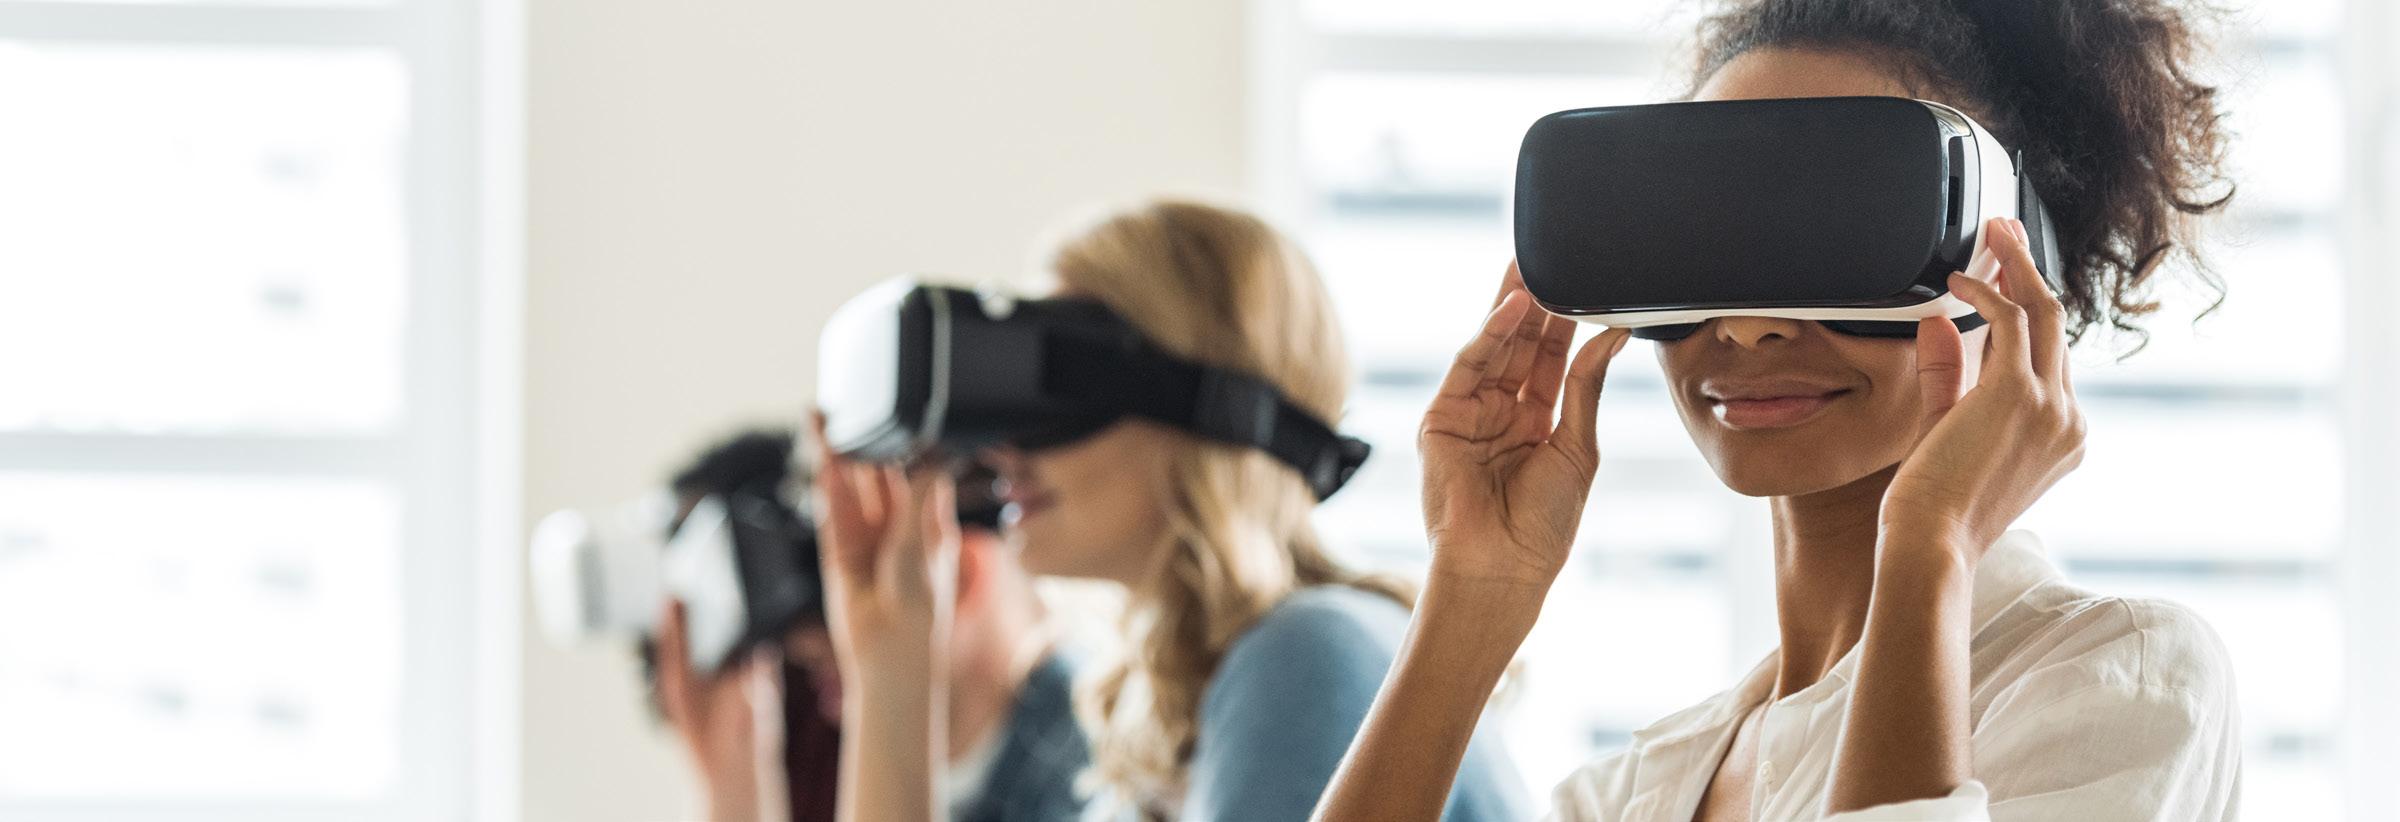 Augmented Reality and Virtual Reality Image